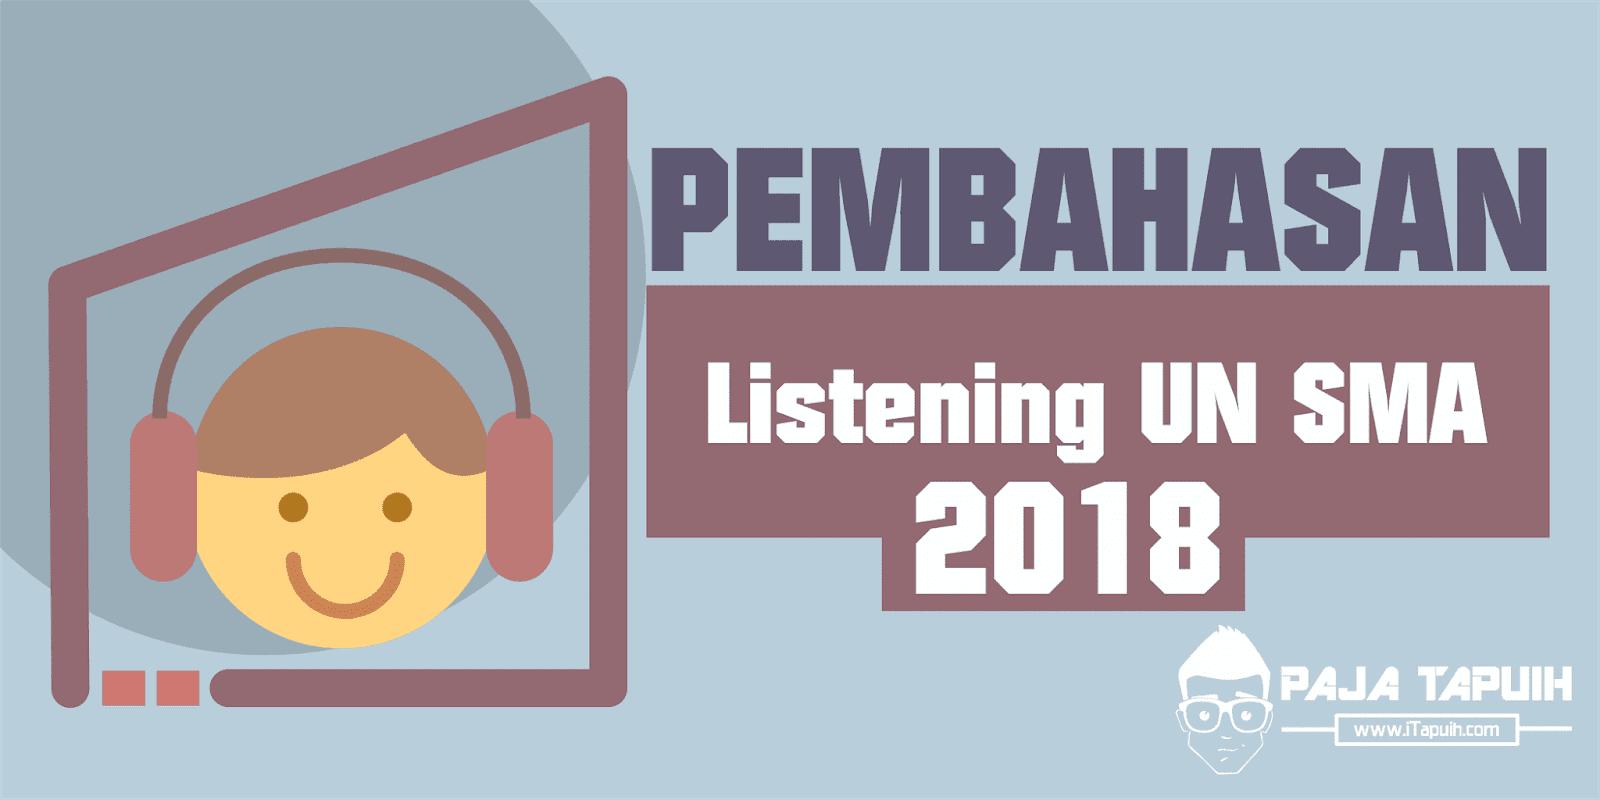 Soal Listening Un Sma 2018 Beserta Pembahasan Paja Tapuih